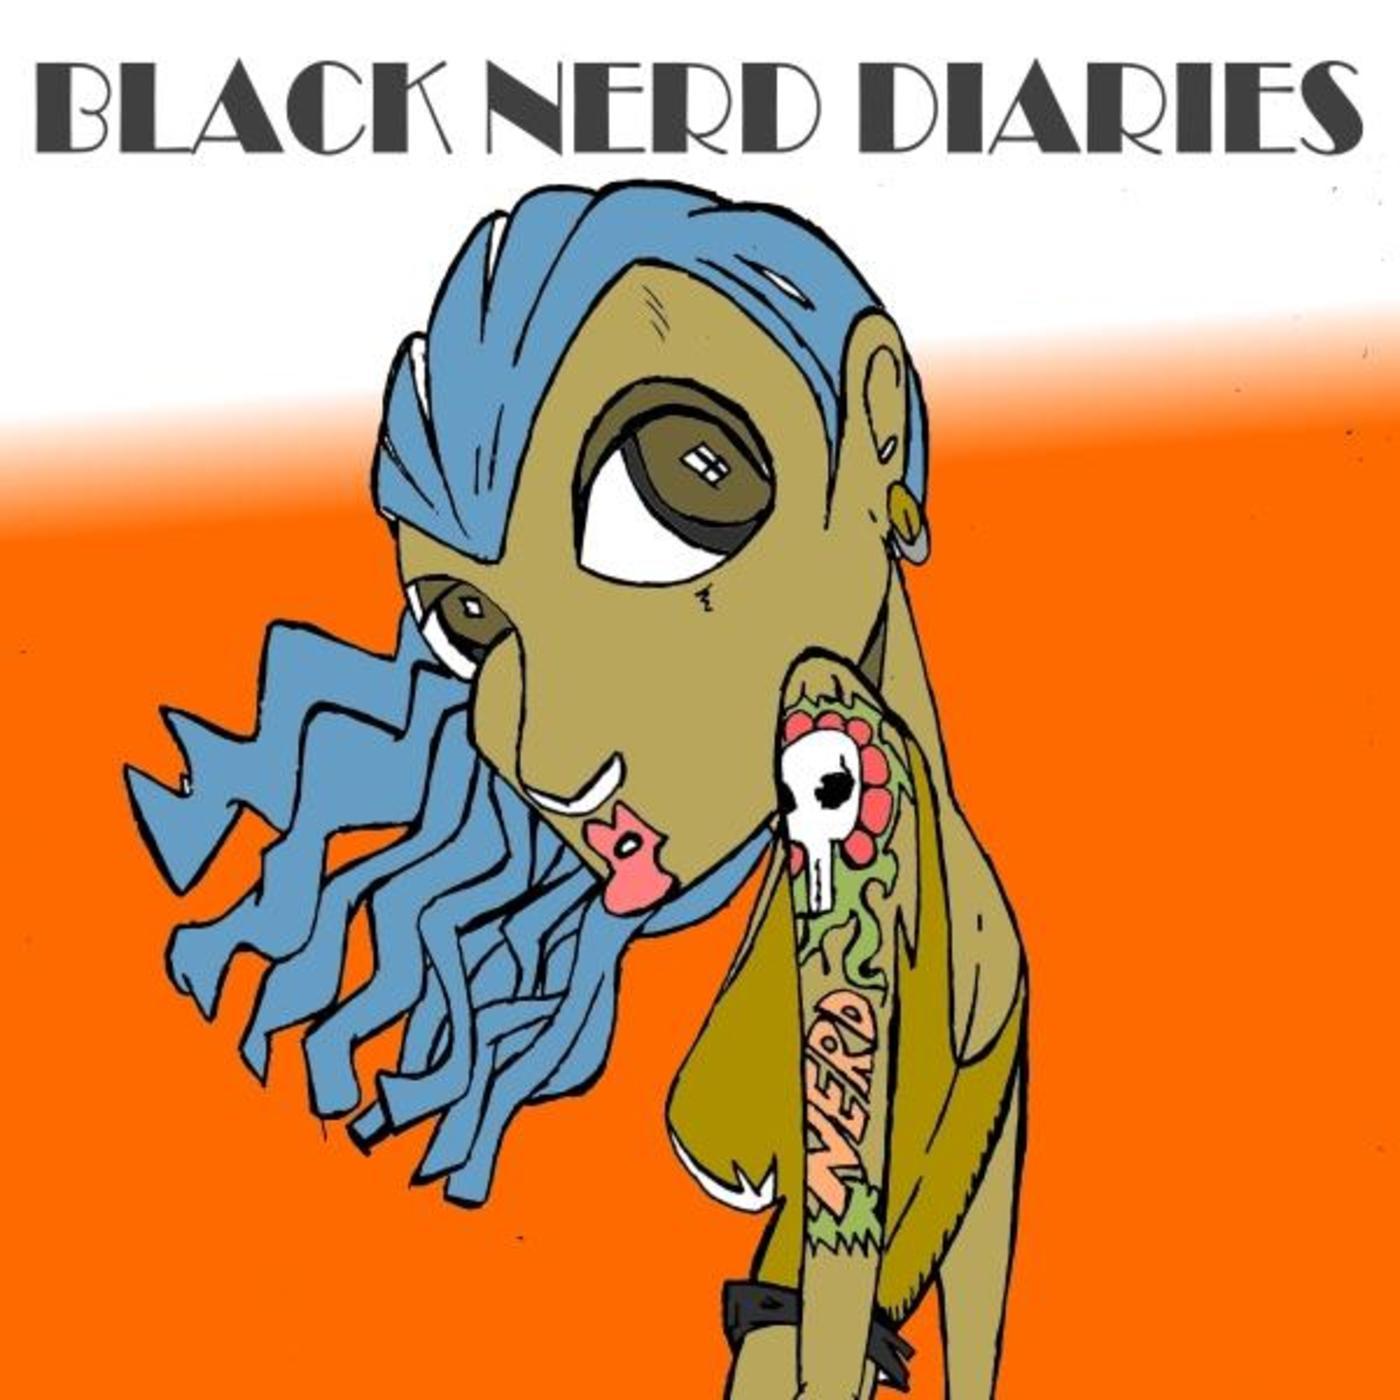 BLACK NERD DIARIES